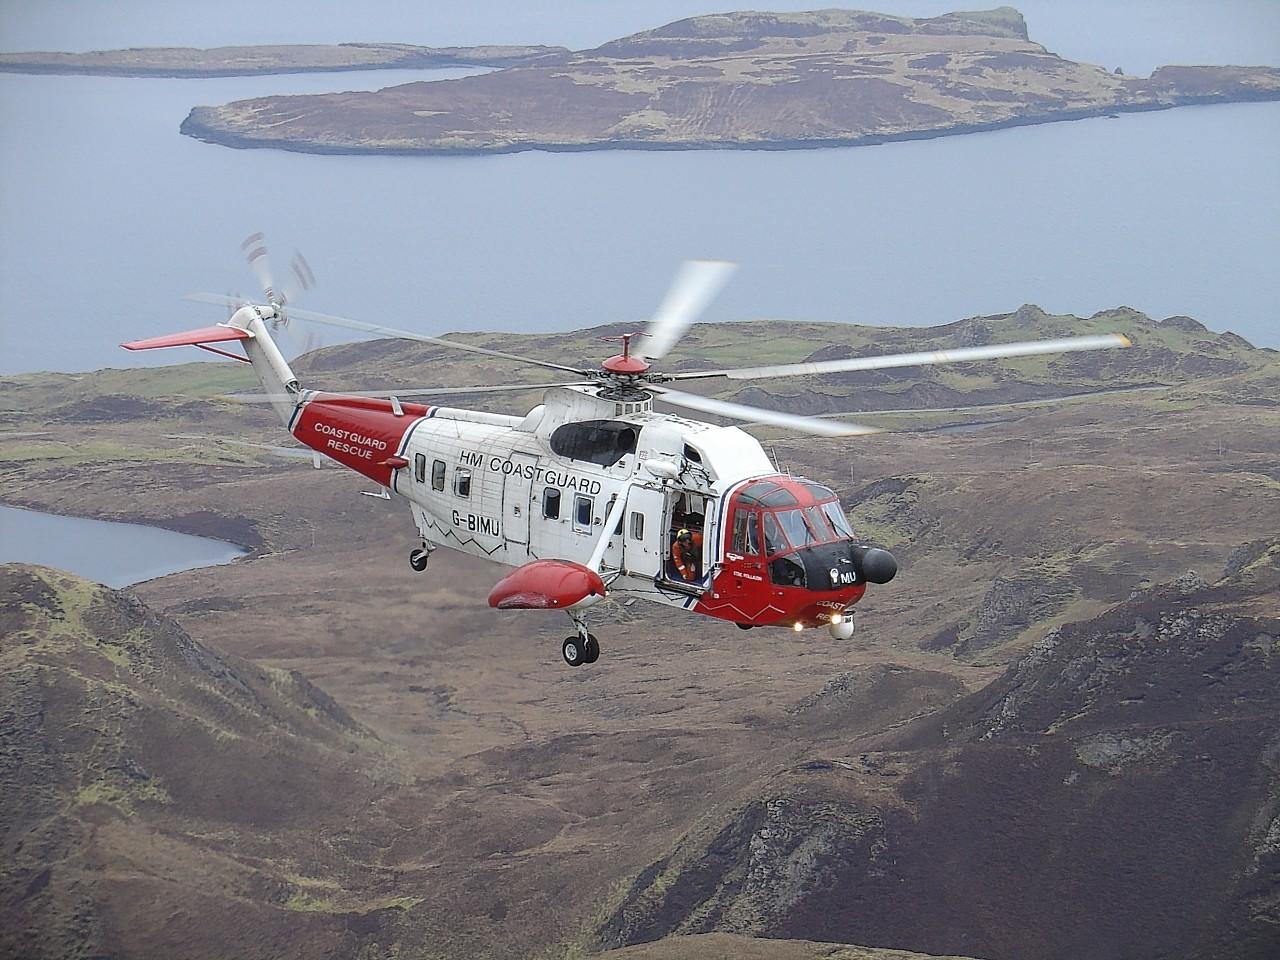 Stornoway Coastguard helicopter